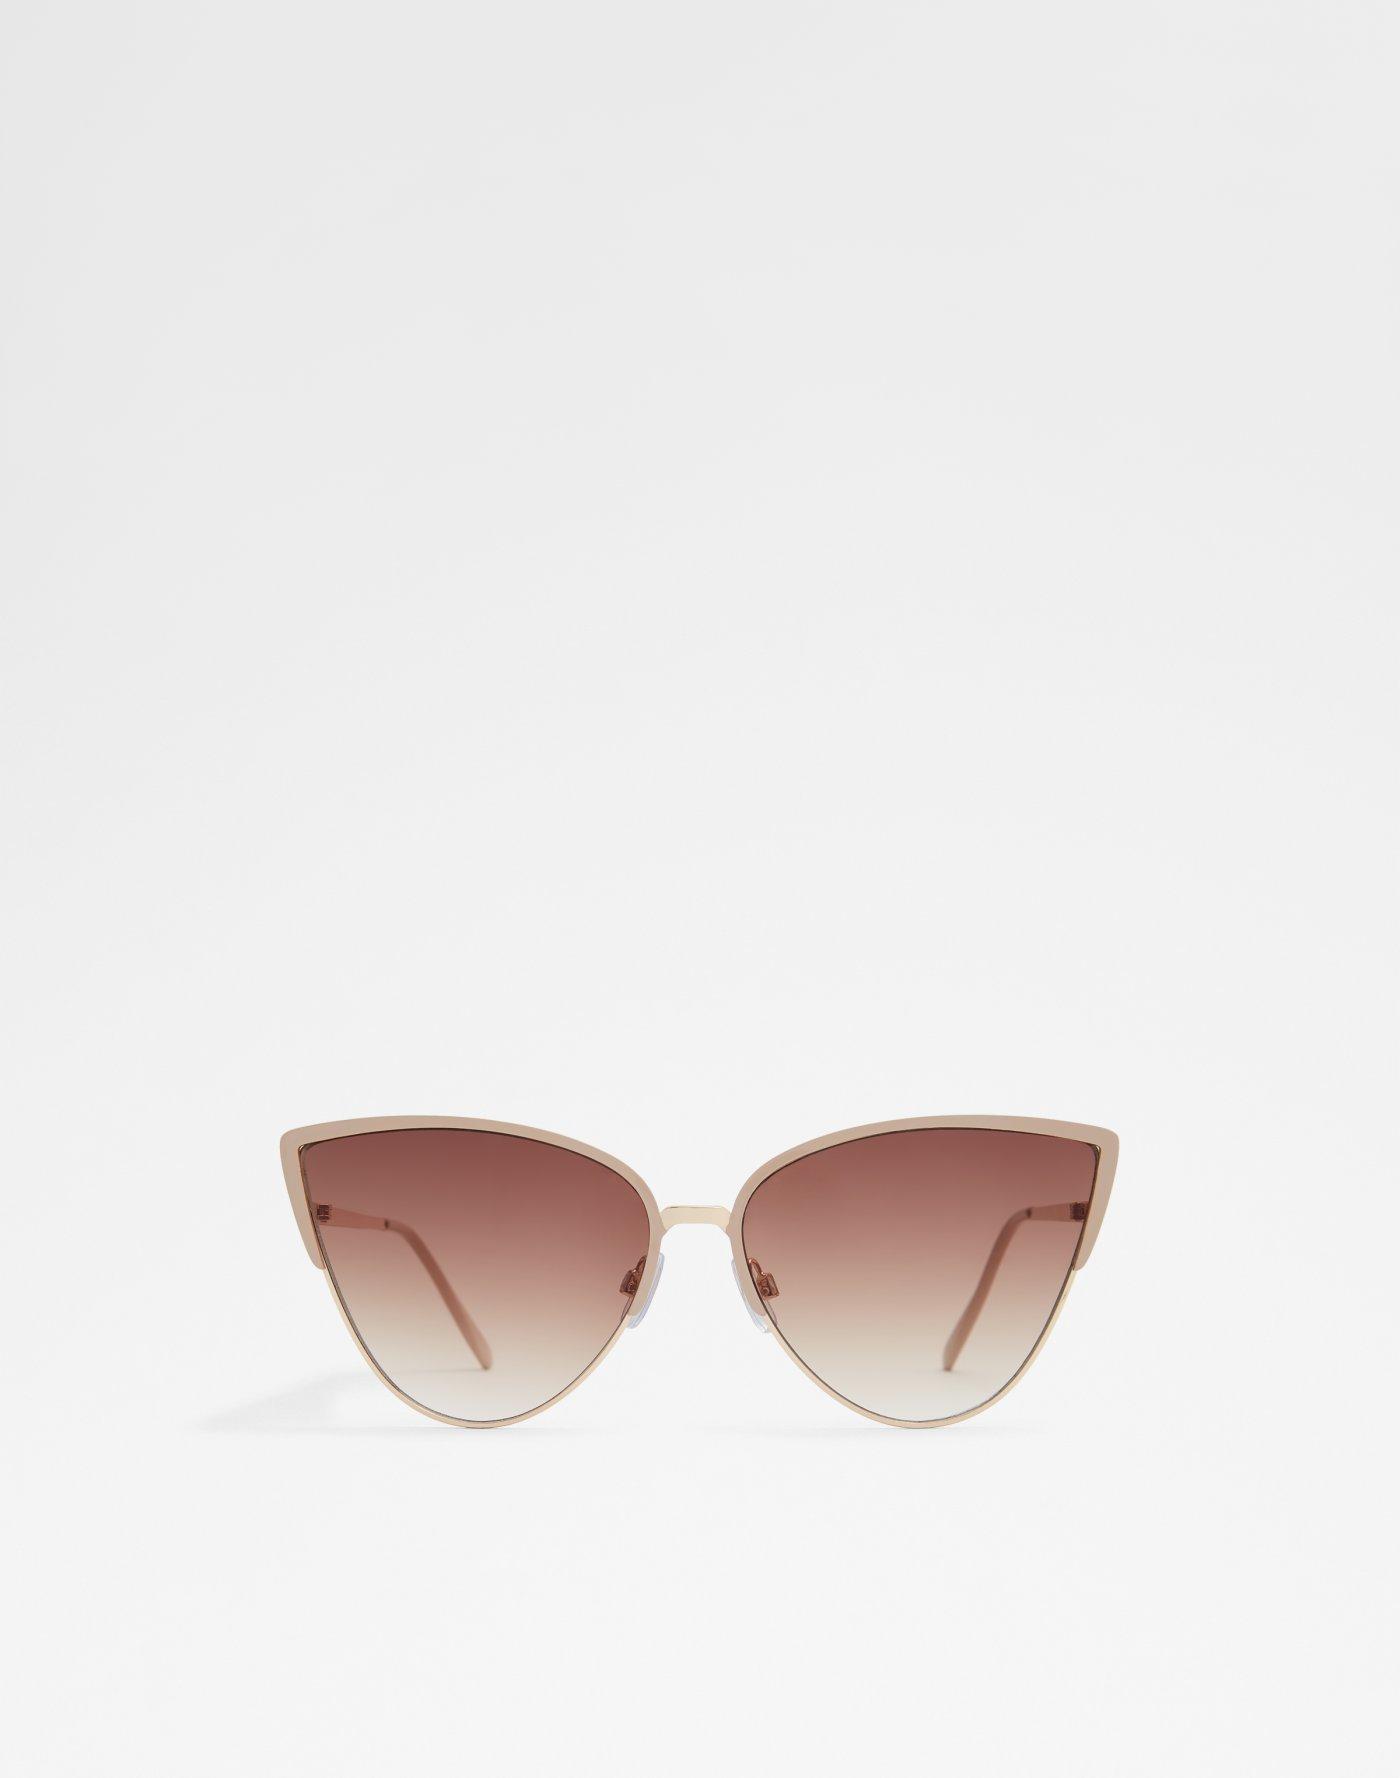 5972140c543e Women's Sunglasses | Fashion Sunglasses | ALDO US | Aldoshoes.com US